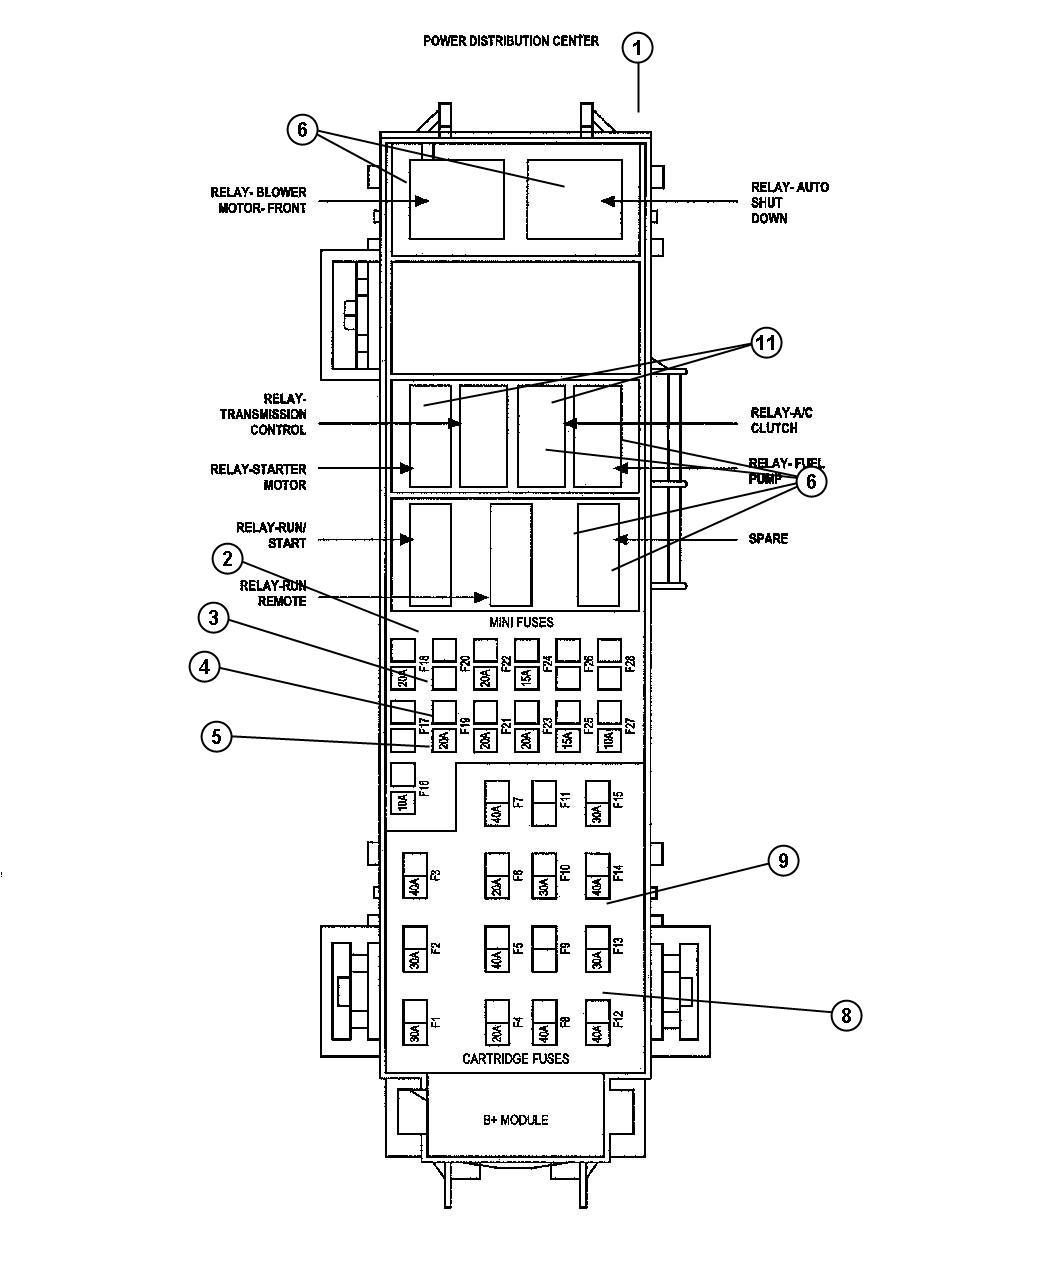 dodge durango cover  power distribution center  ipm module pdc center